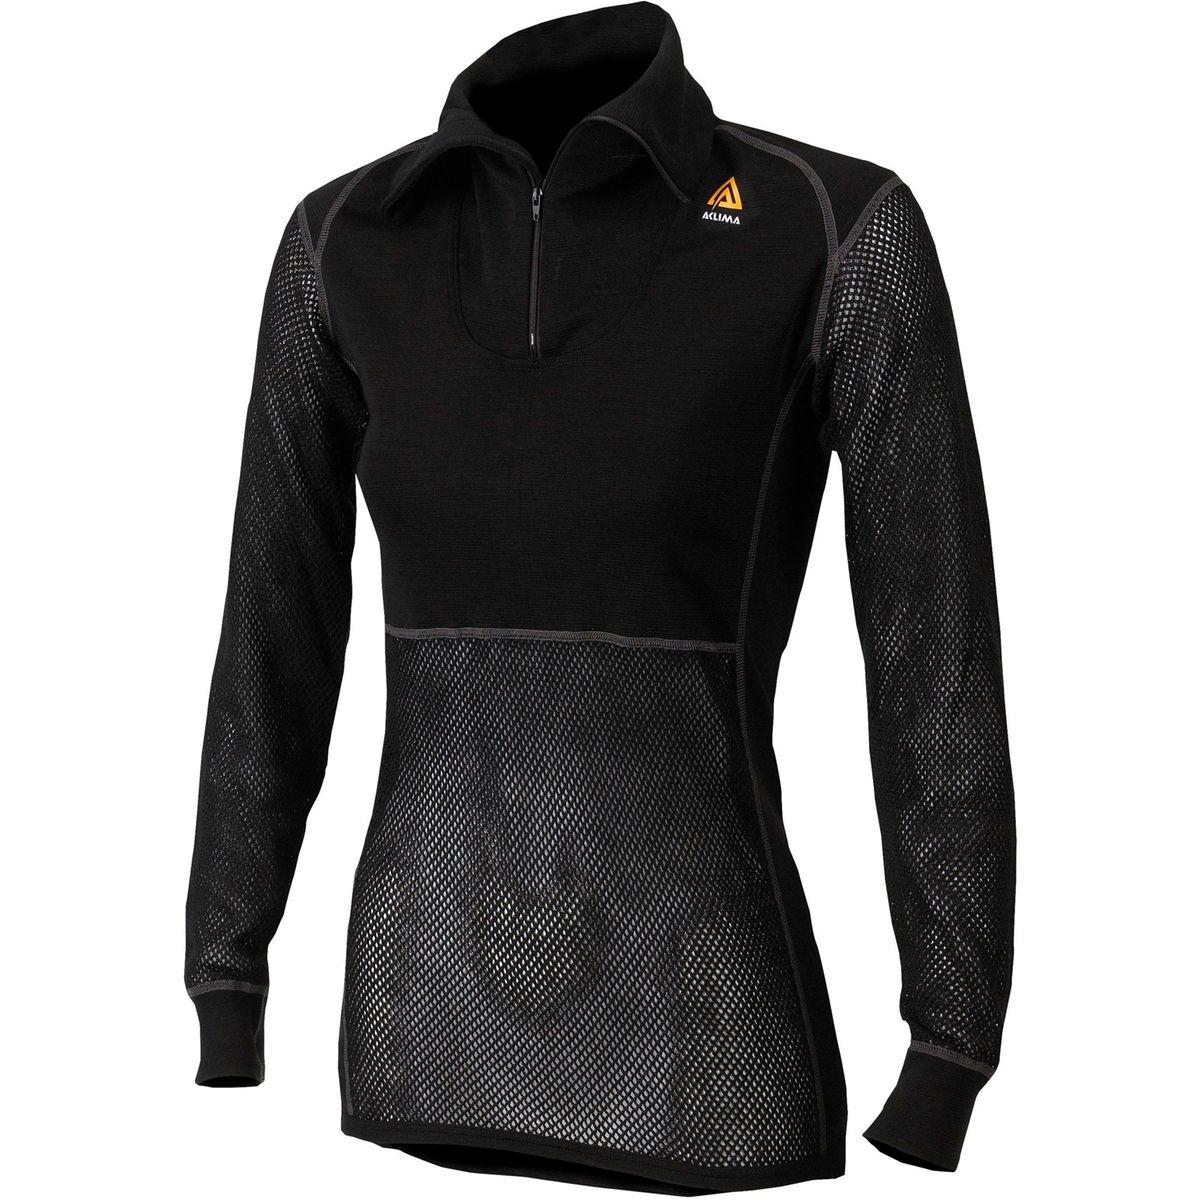 WoolNet - Sous-vêtement Femme - with Zip noir